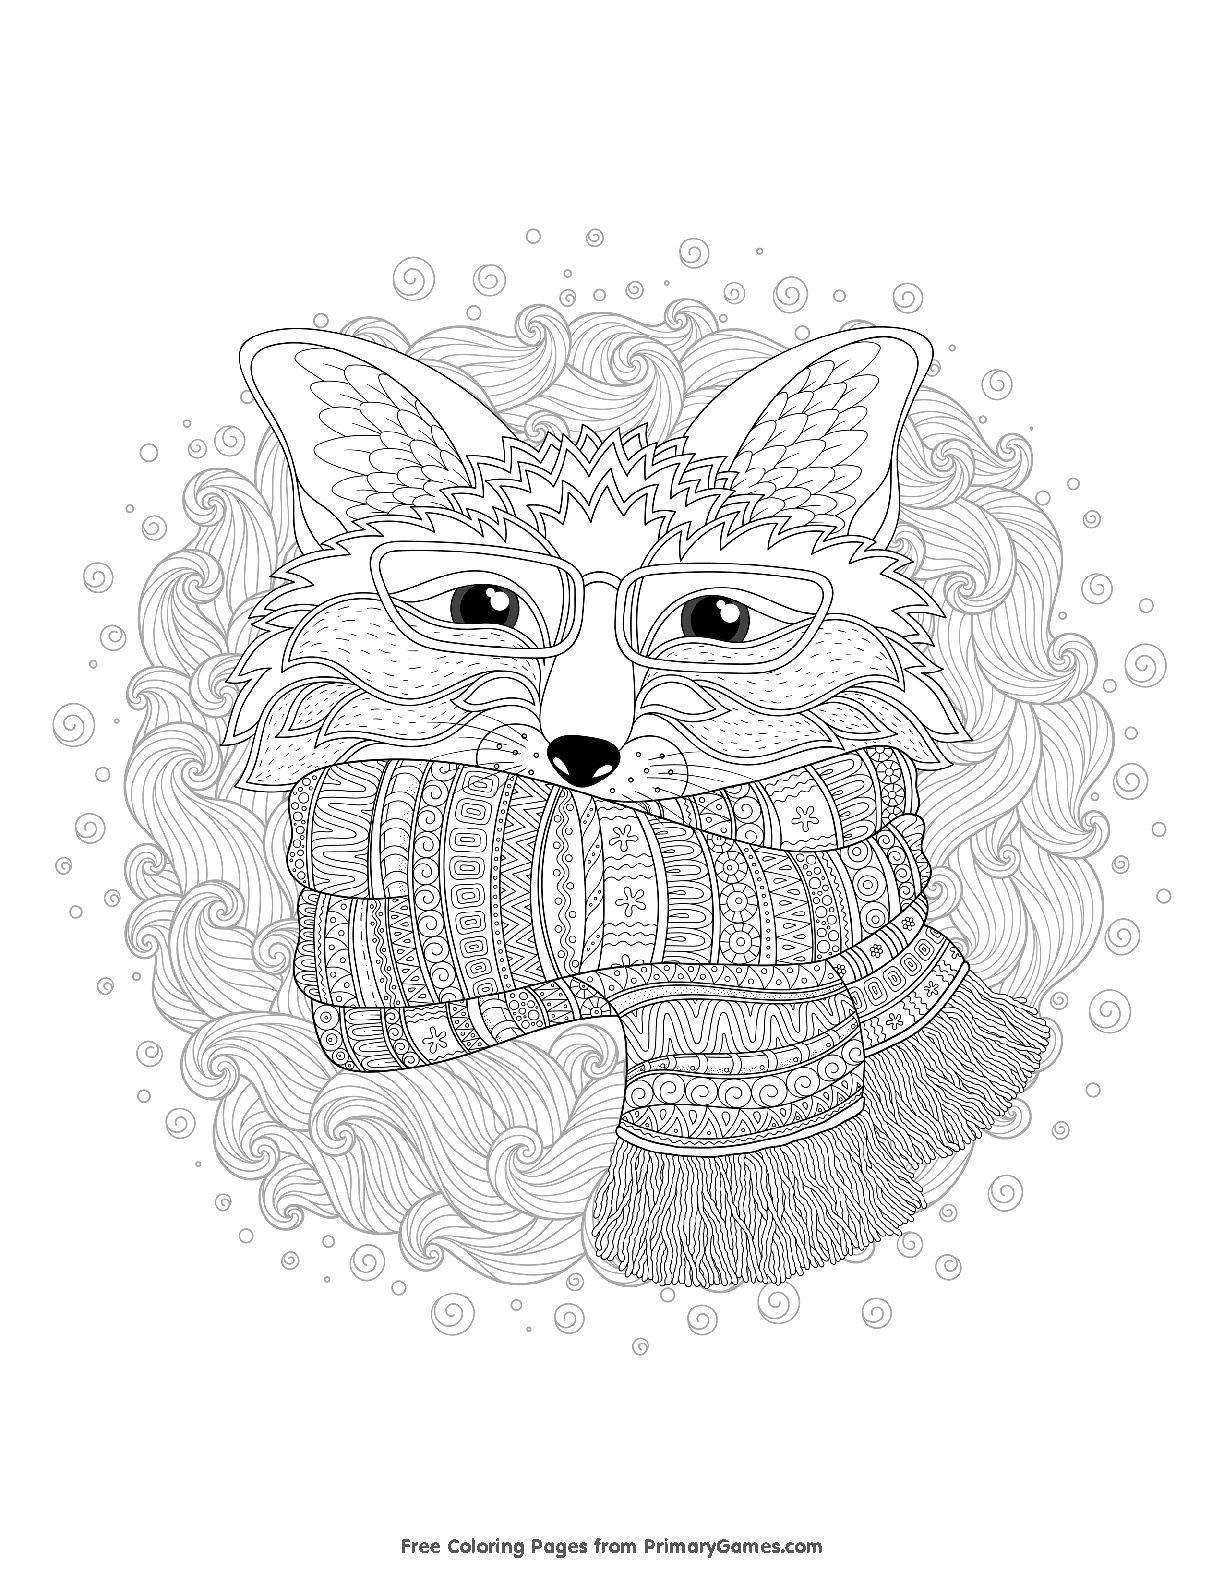 Pin By Katharina Kostritzer On Coloring Anti Stress Raskraski Antistress Fox Coloring Page Coloring Pages Winter Coloring Pages